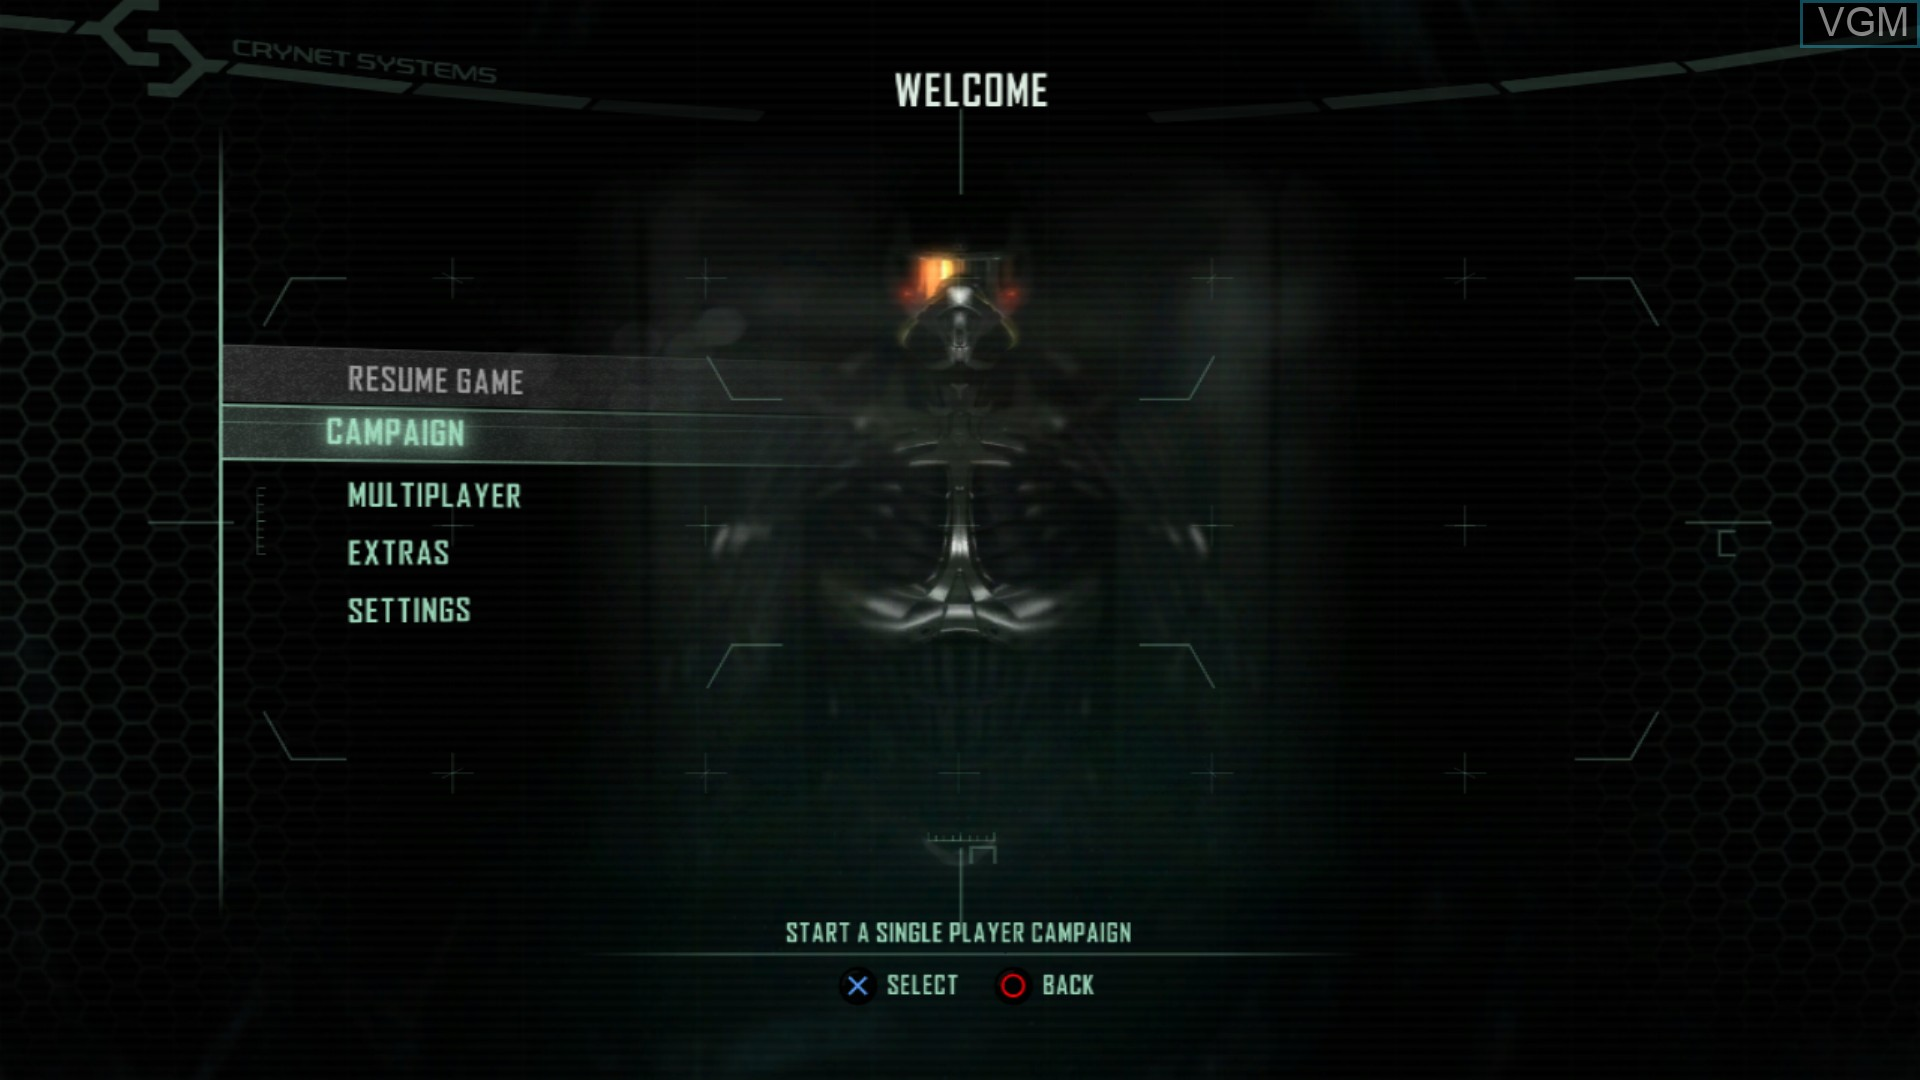 Image du menu du jeu Crysis 2 sur Sony Playstation 3